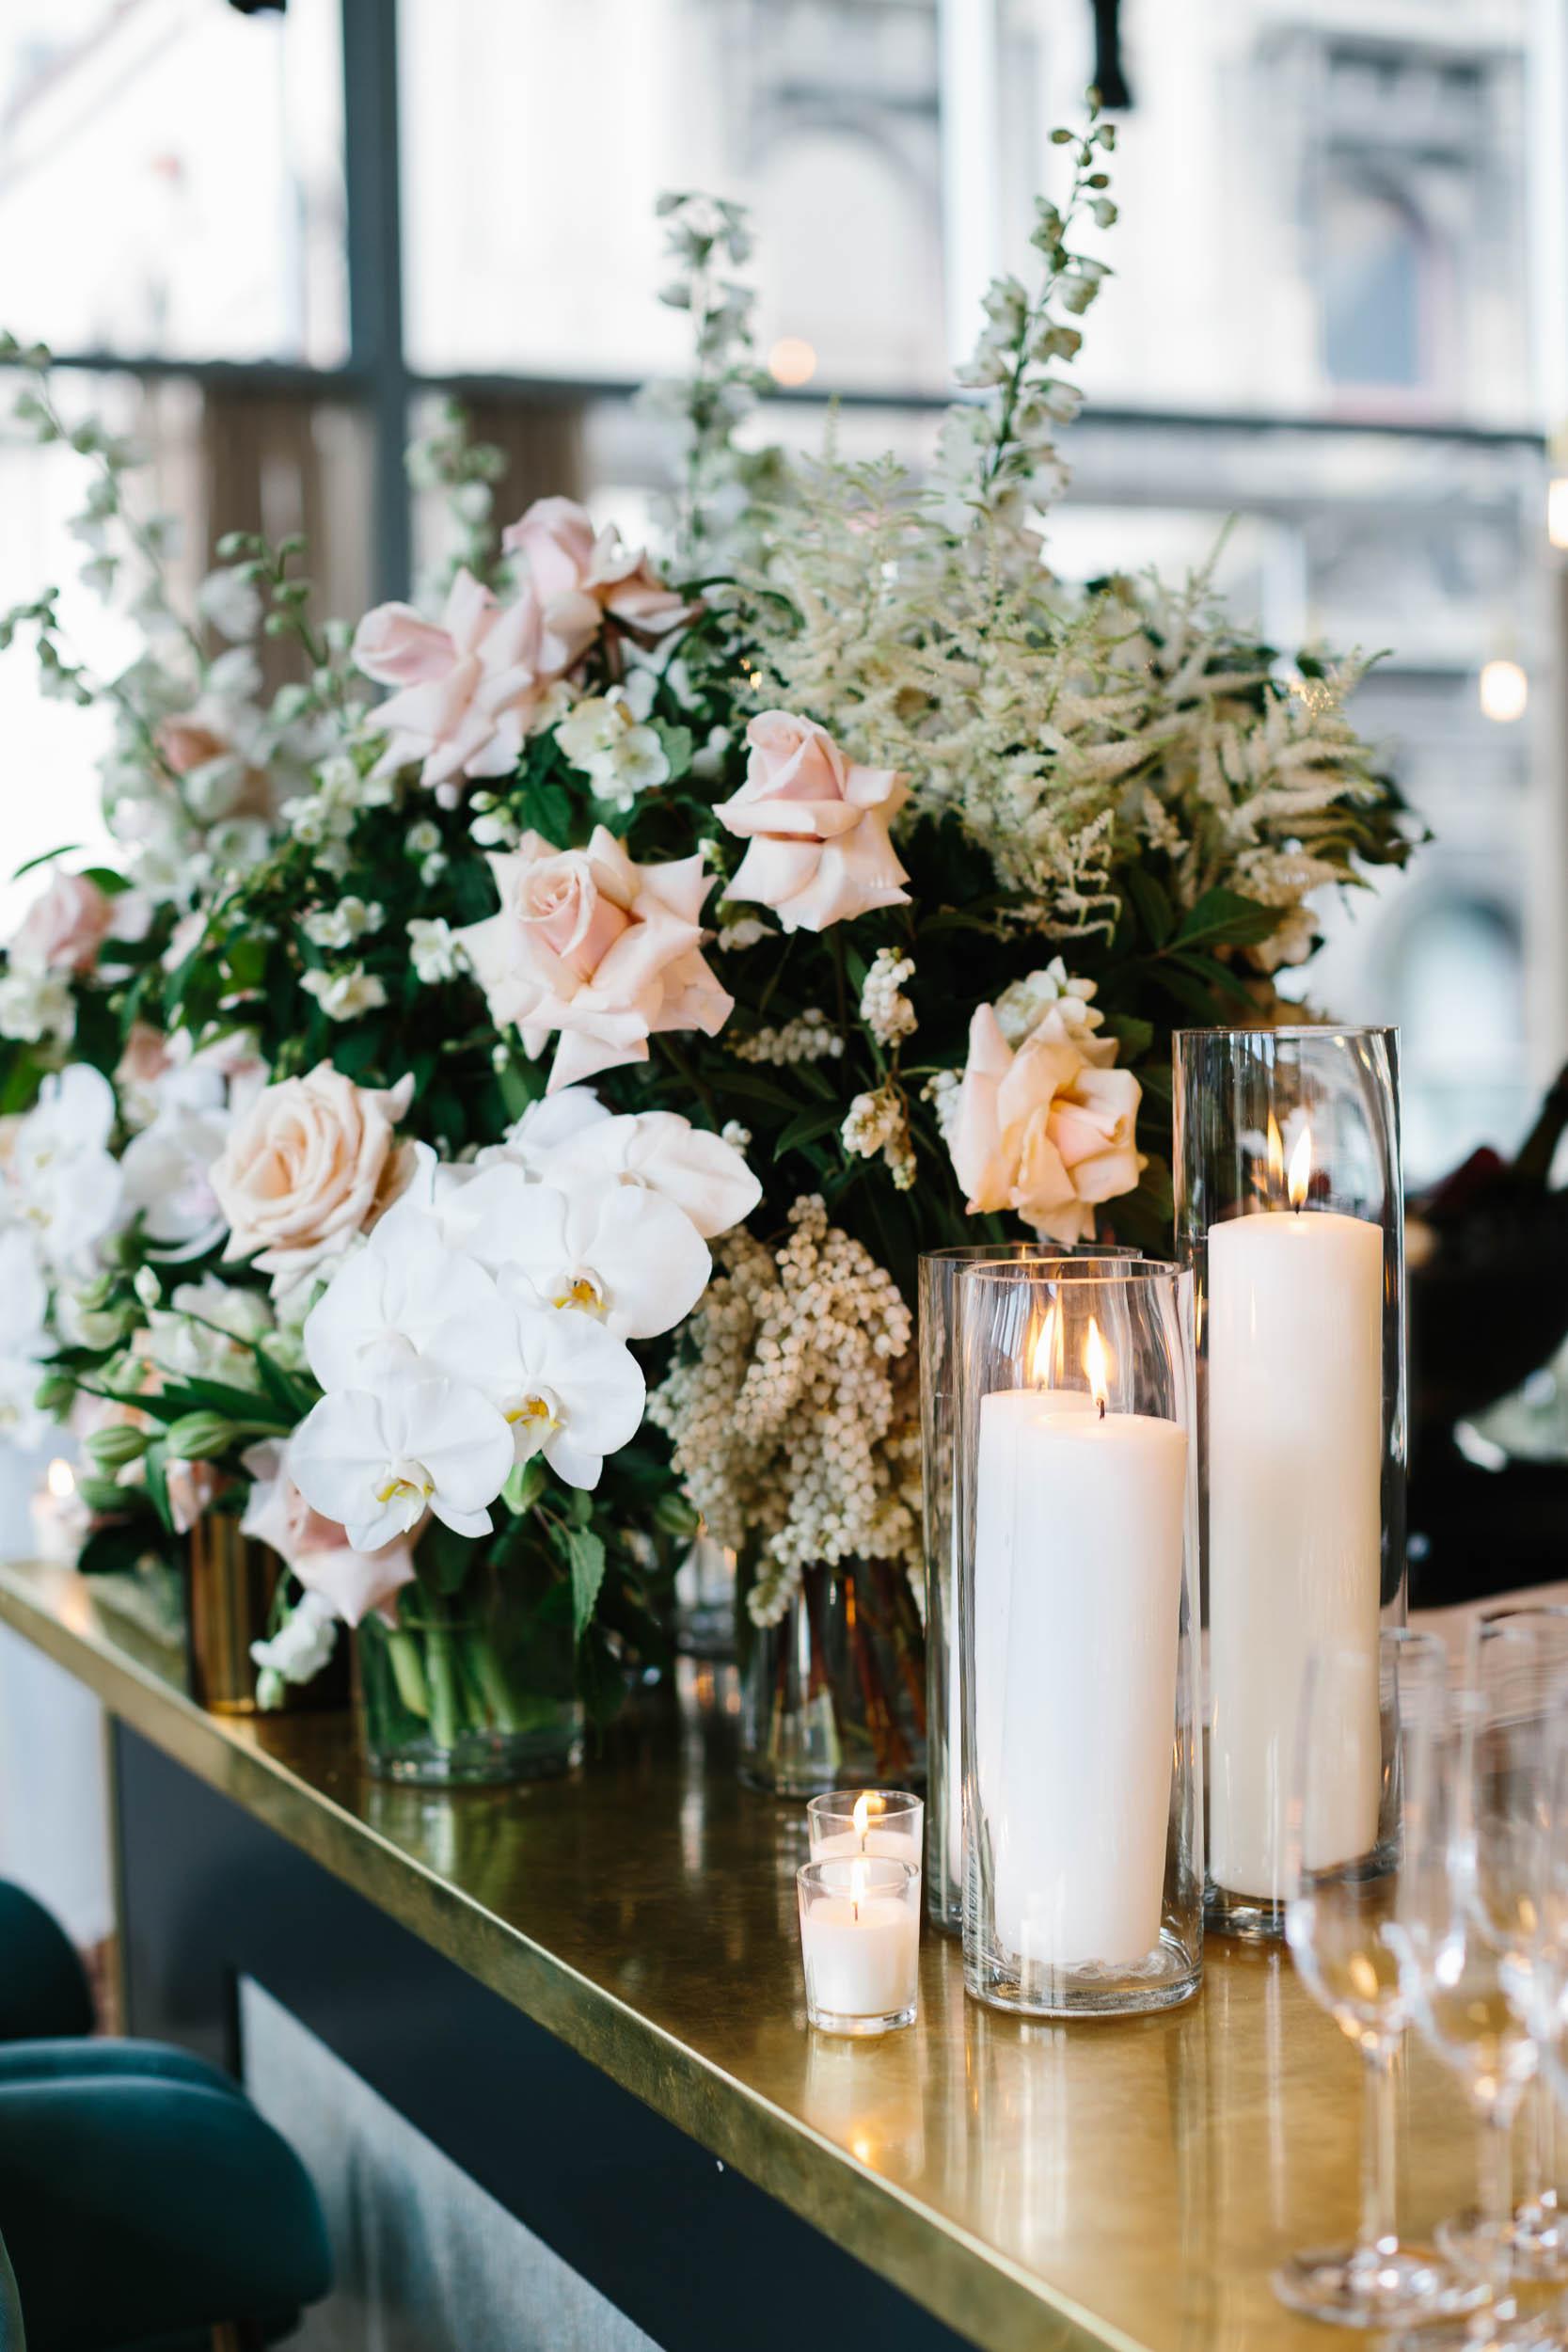 Kas-Richards-Wedding-Photographer-Melbourne-City-Wedding-Alto-Event-Space-Jane-Hill-Bridal-Gown-43.jpg